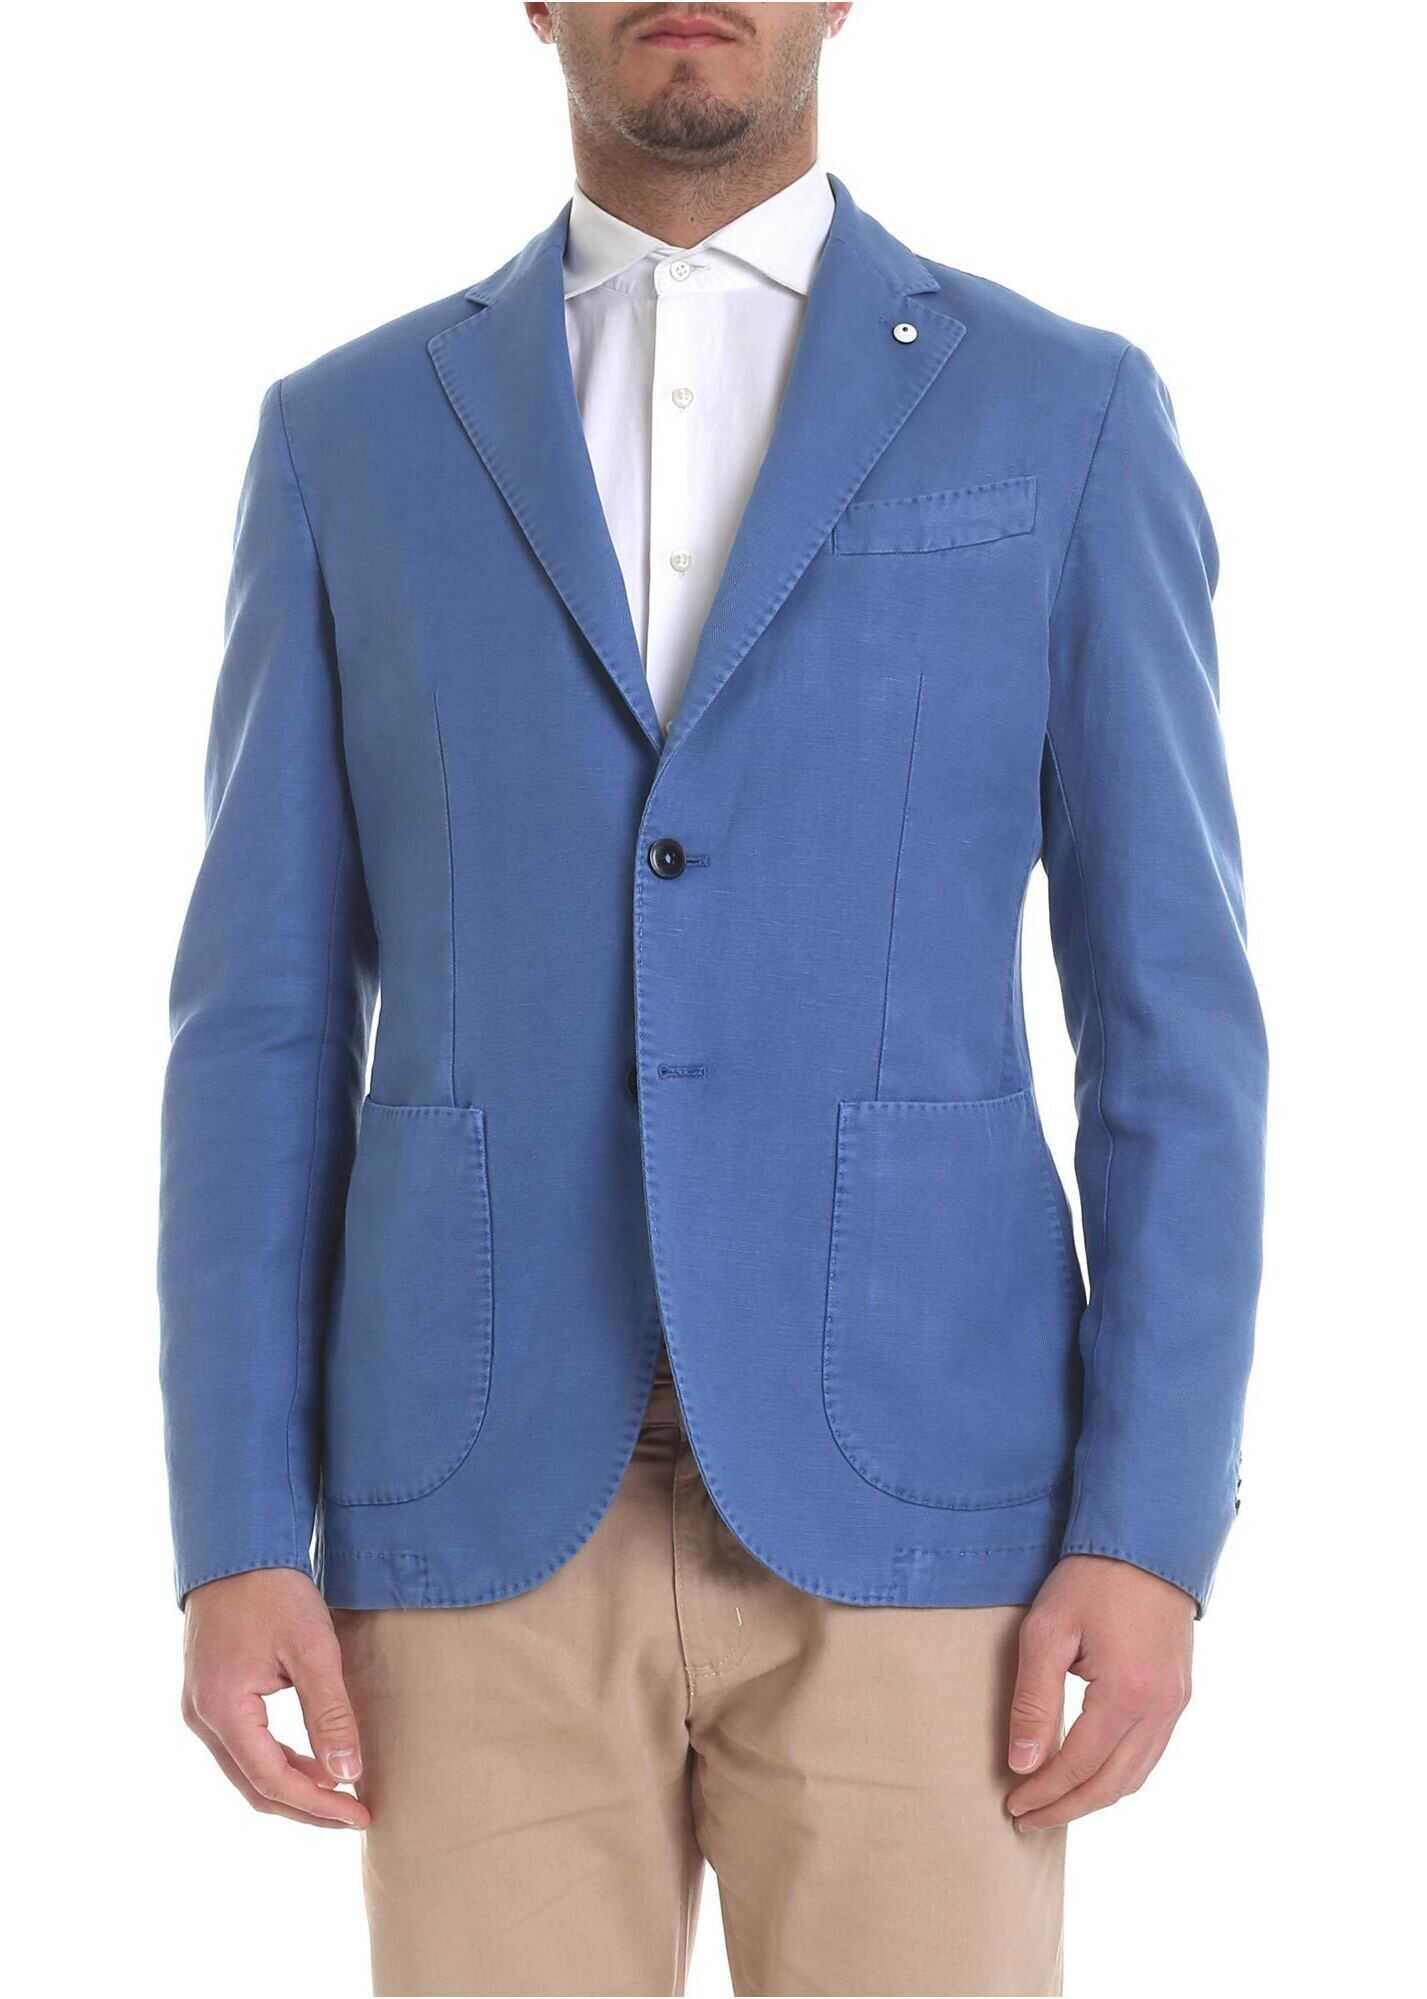 L.B.M. 1911 Jacket In Light Blue With Logo Brooch Light Blue